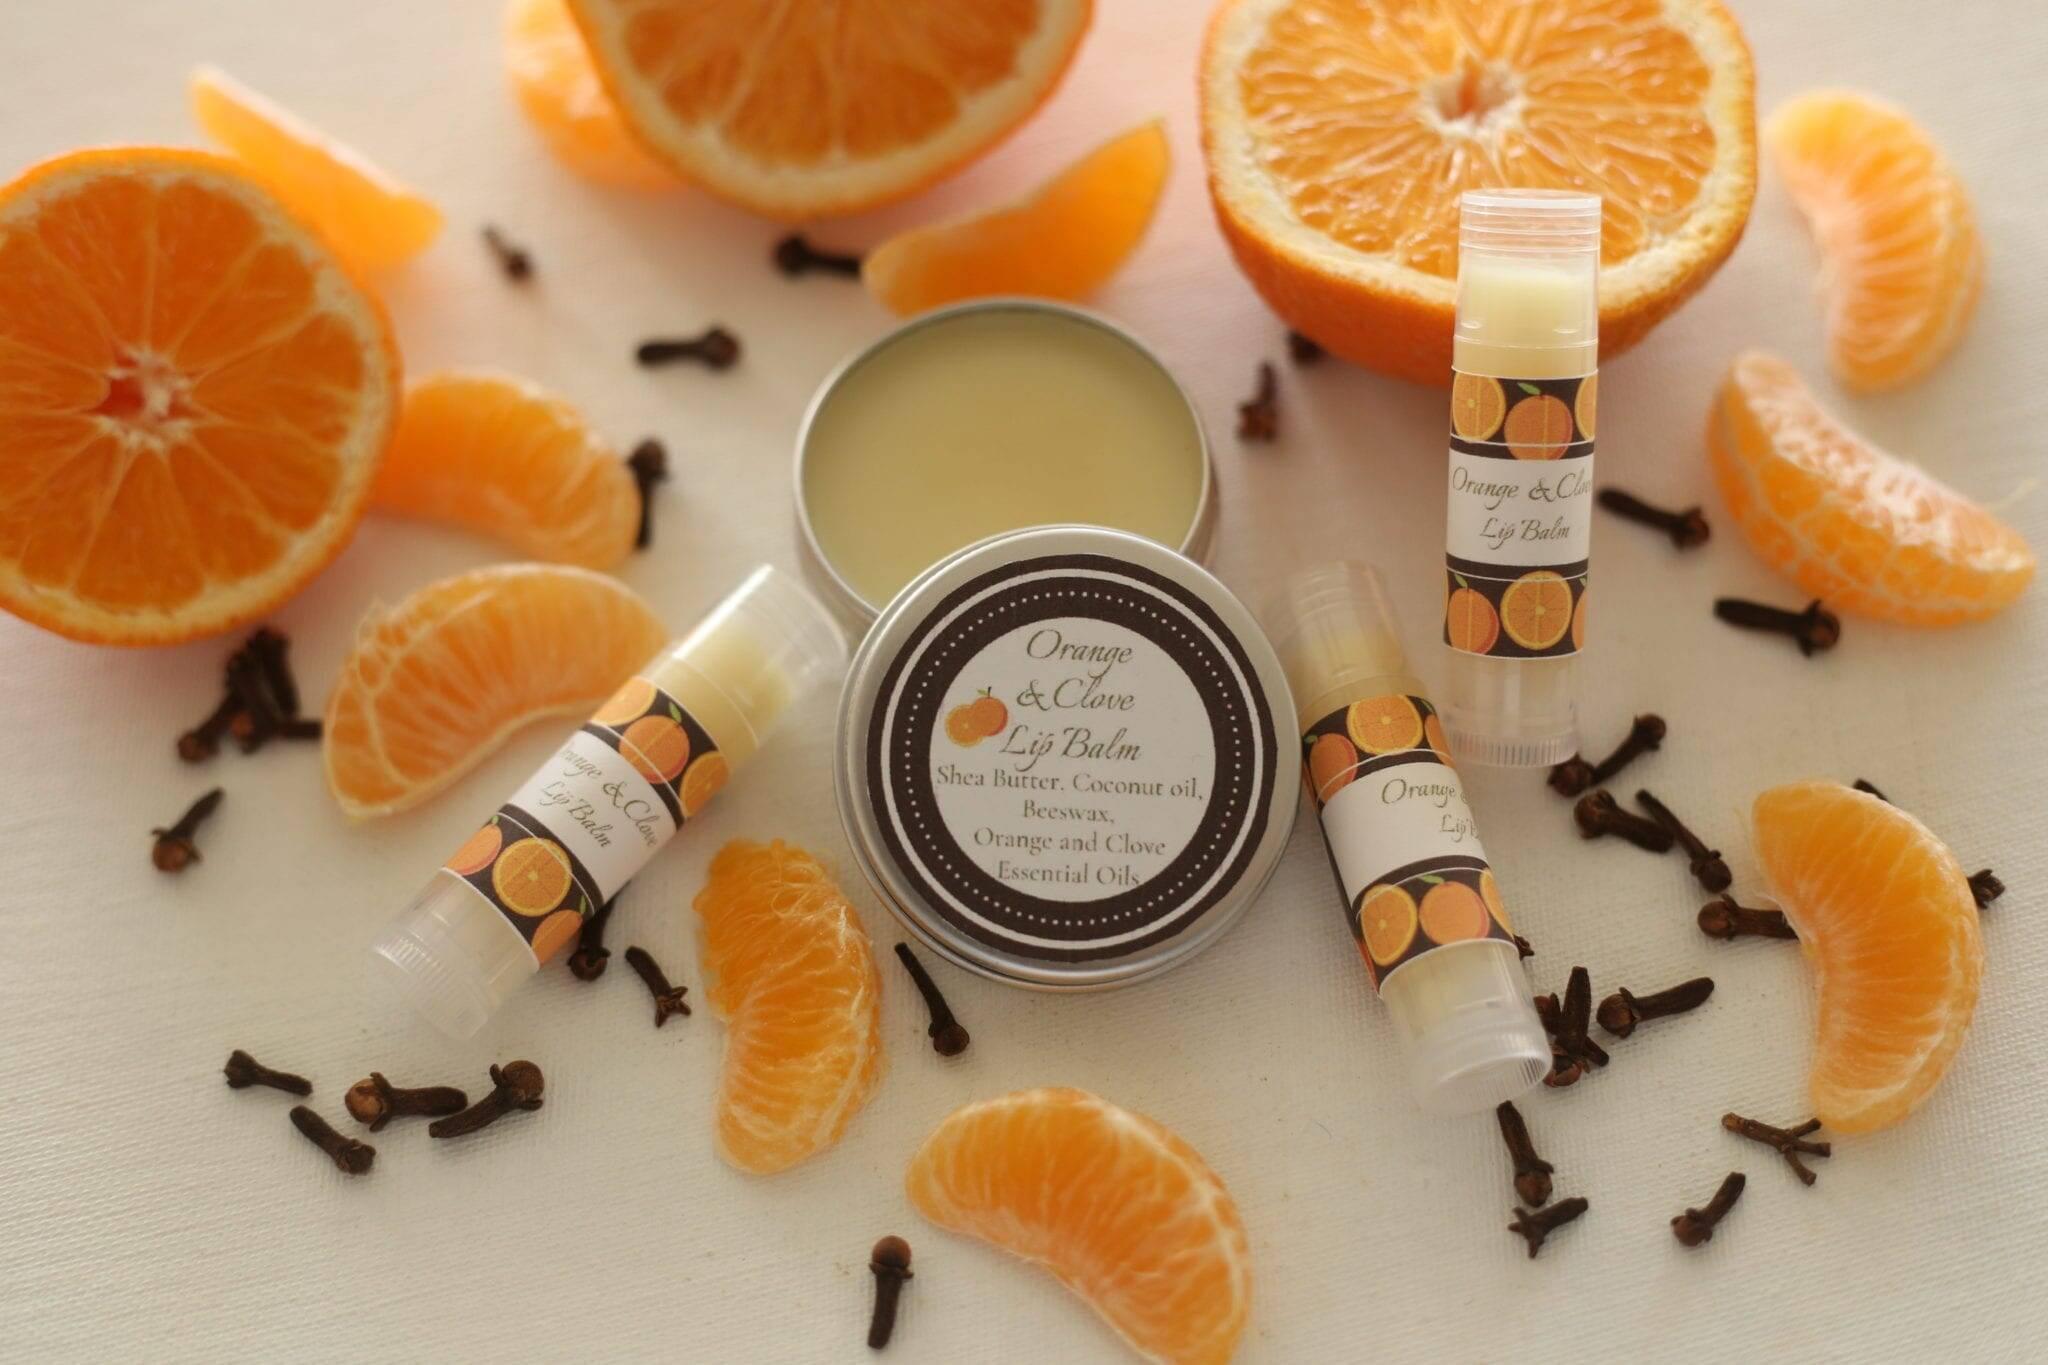 Handmade Orange and Clove Lip Balm